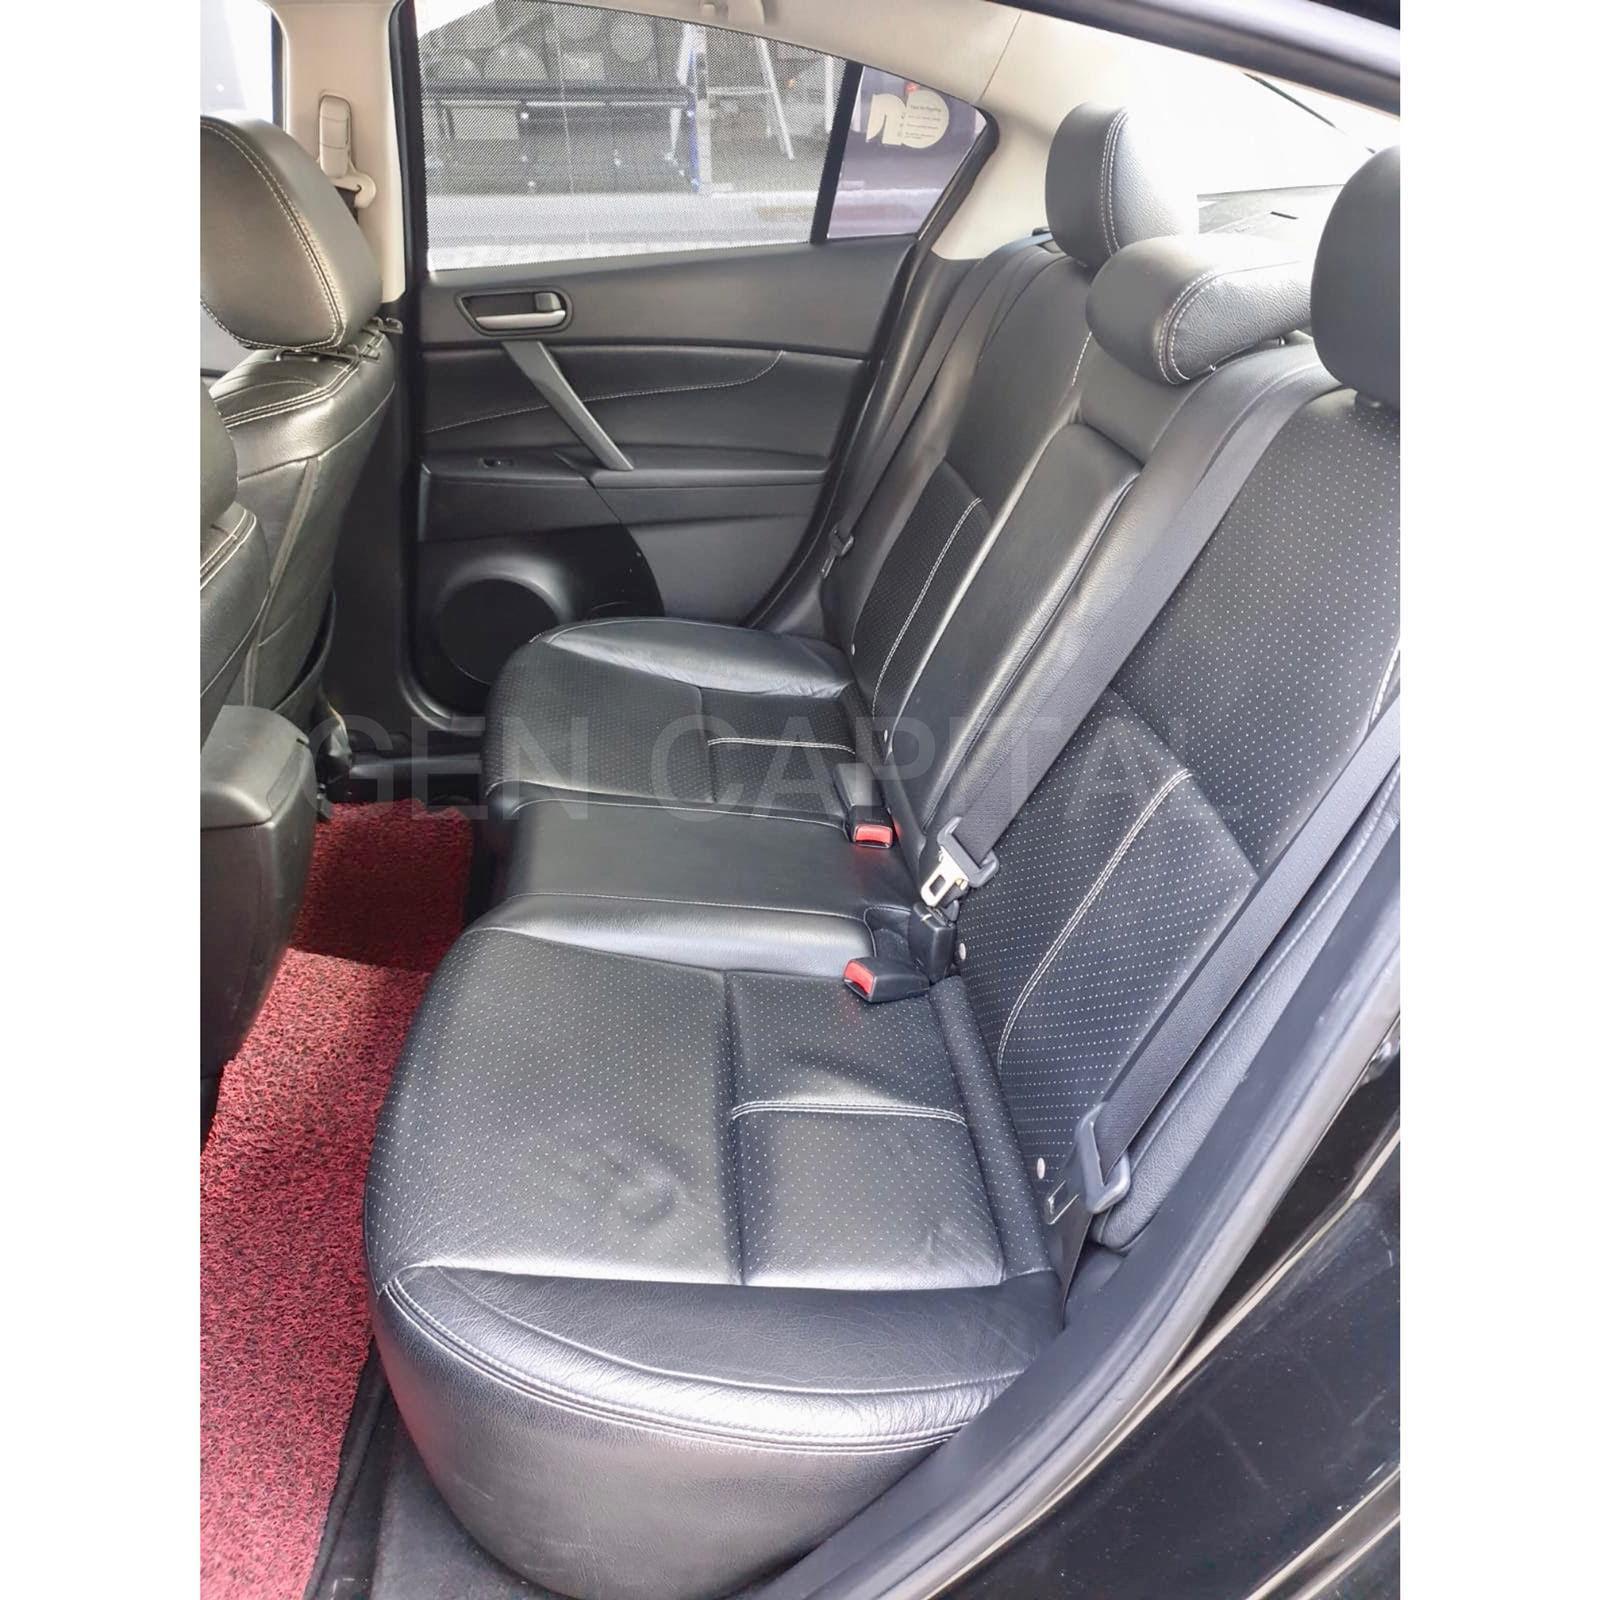 Mazda 3 1.6A Grab Gojek Ryde Tada Friendly & Non PHV Car Rental